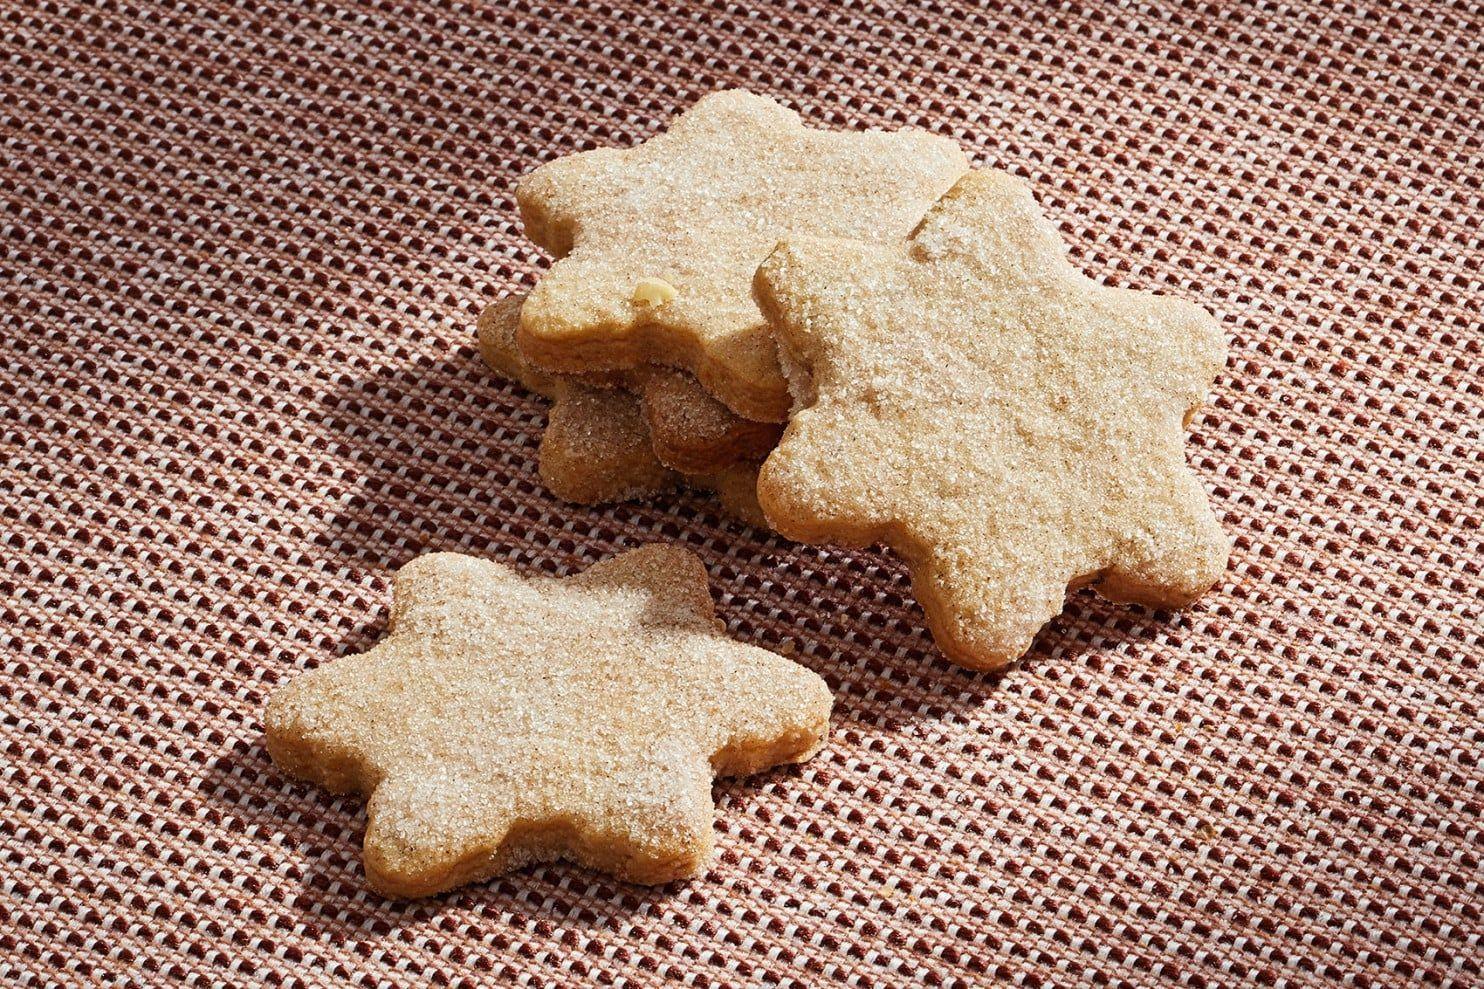 Biscochitos Recipe American cookies recipe, American